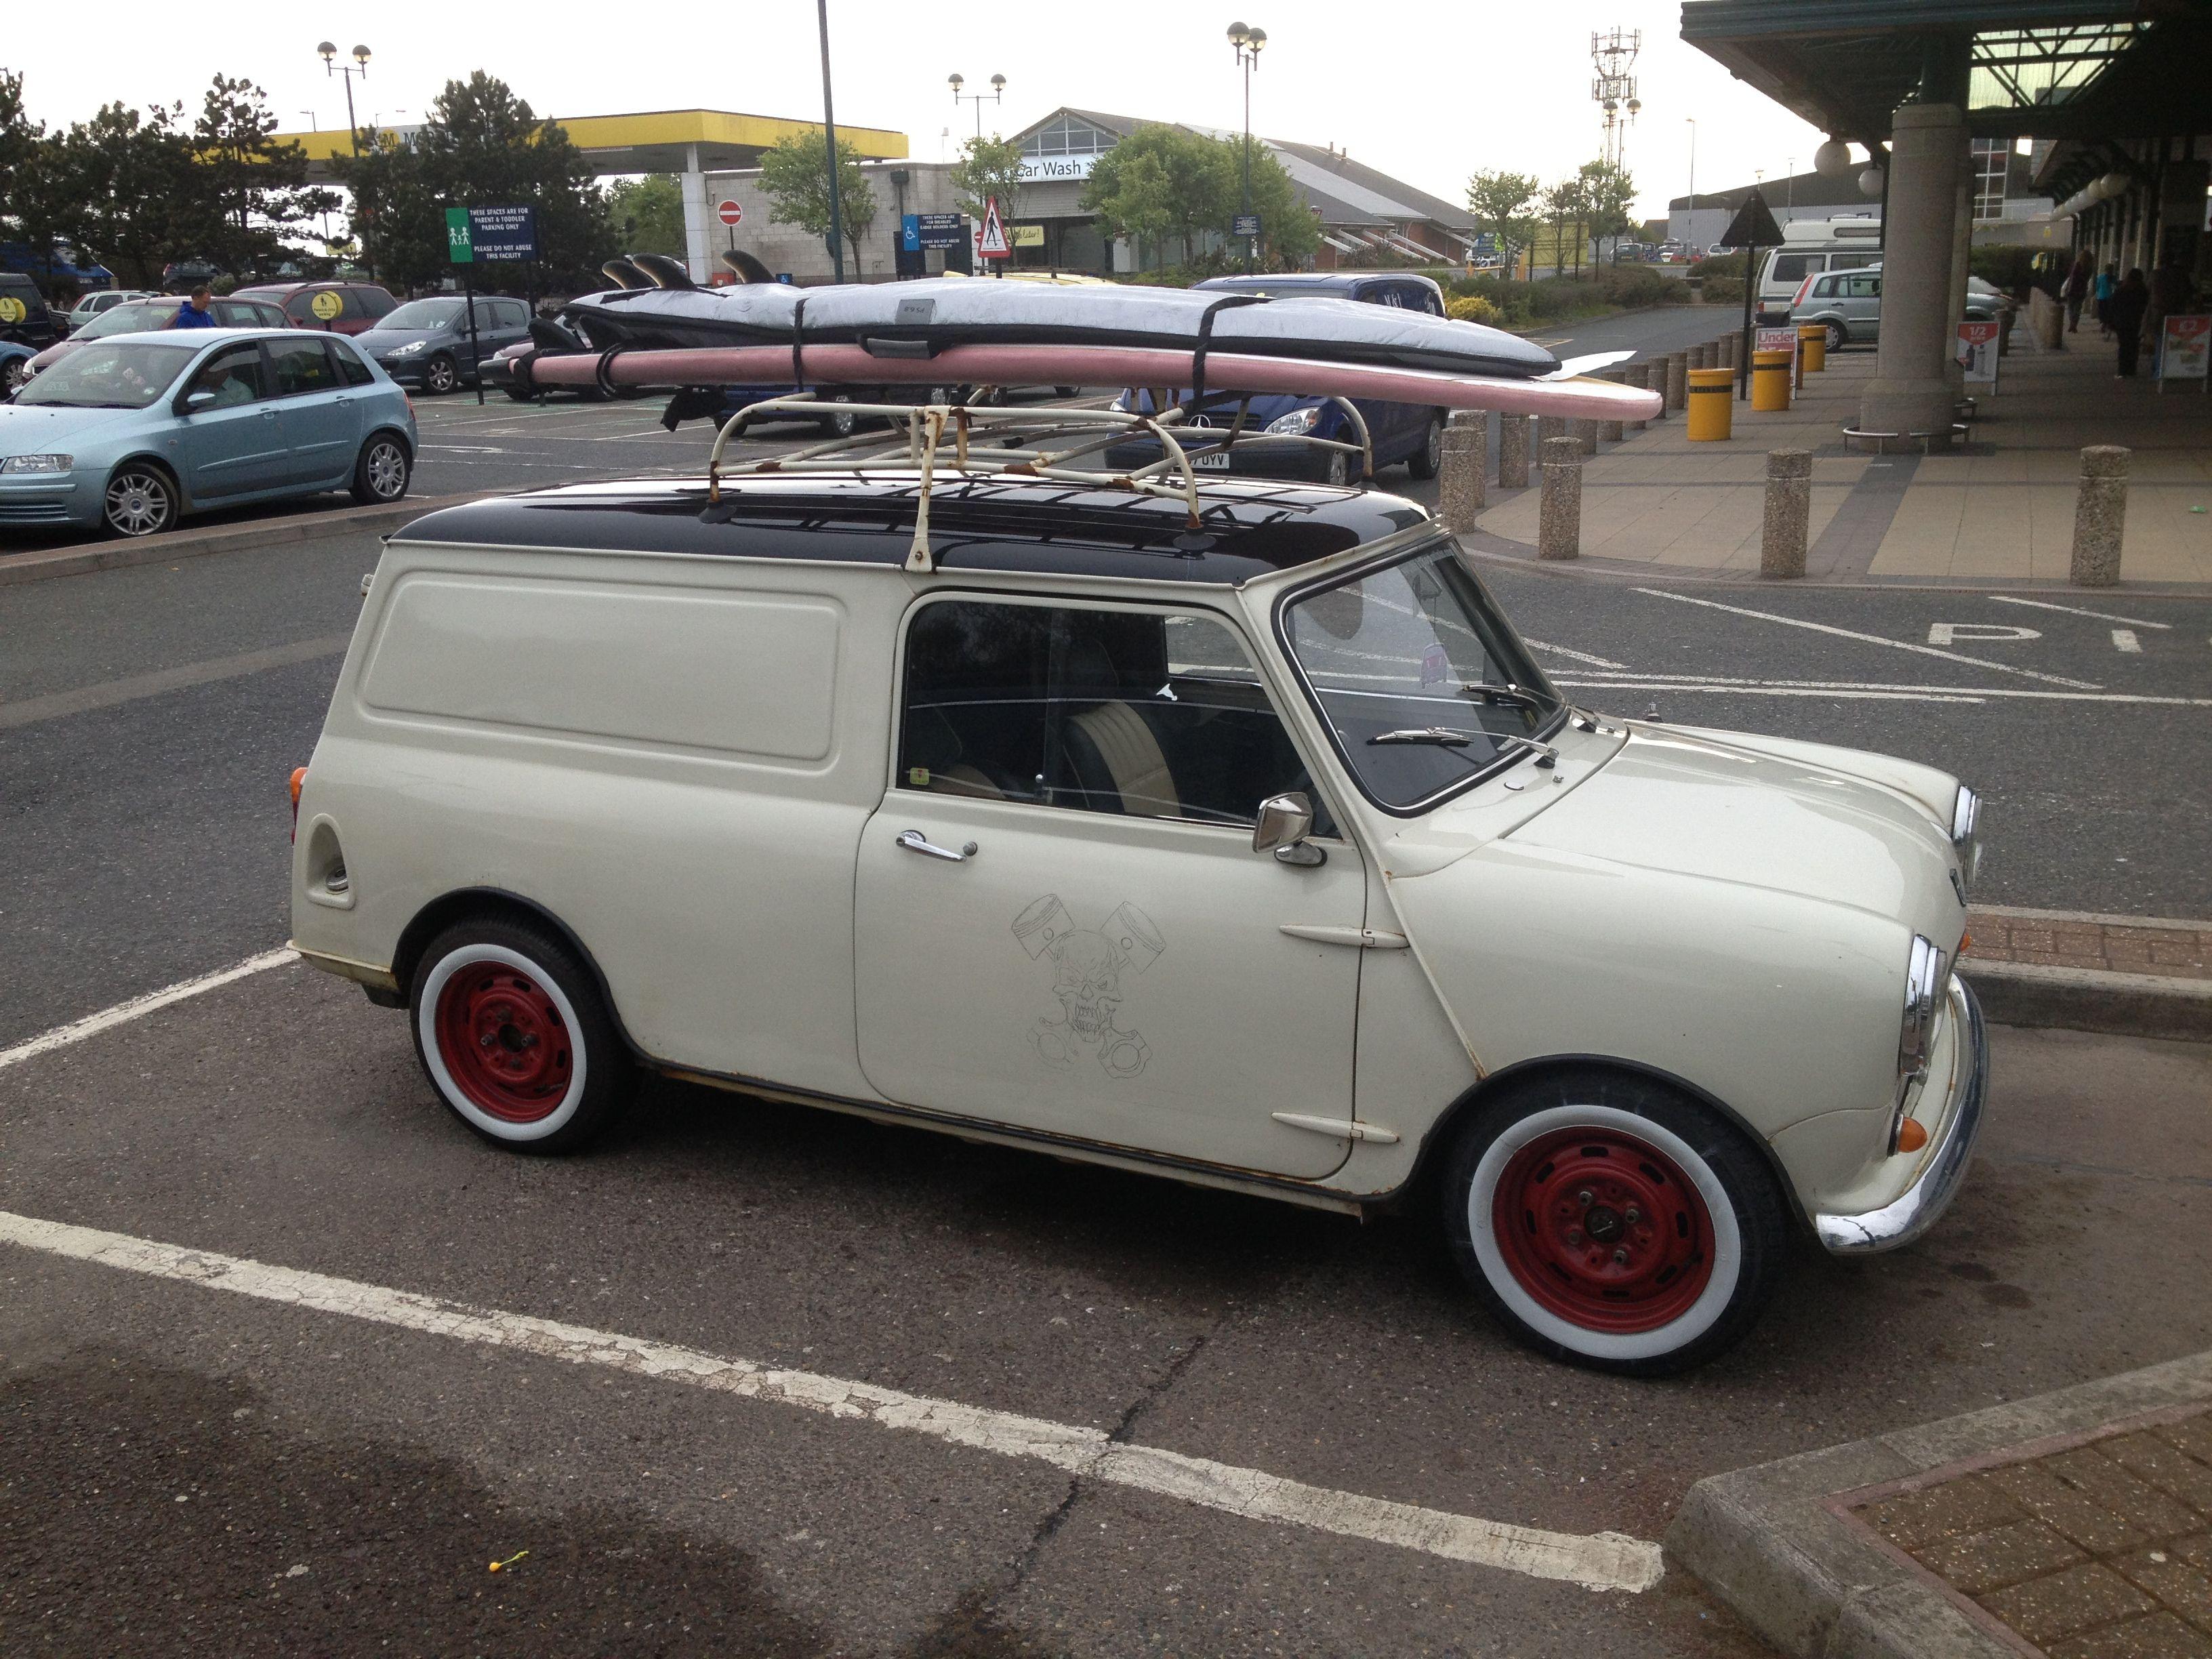 763a35a283f My first car was a Mini van no surf board though | Mini | Mini ...